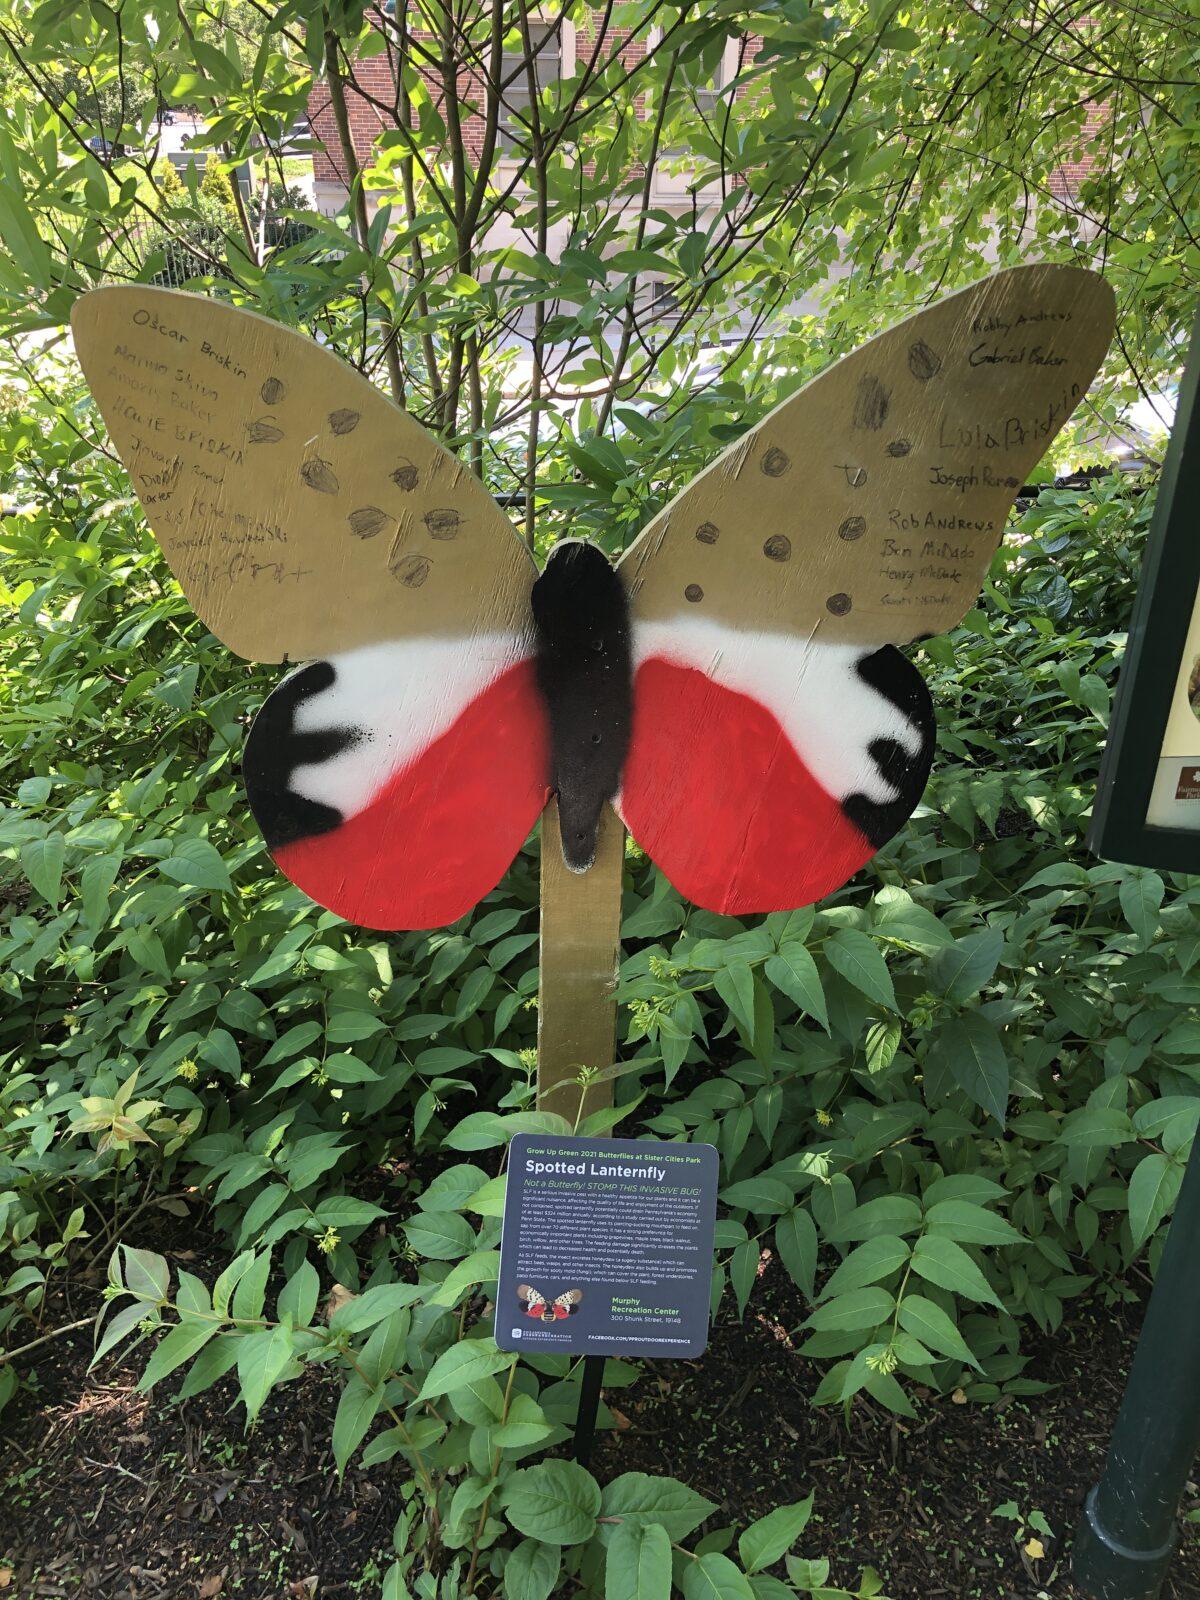 Spotted Lanternfly art exhibit